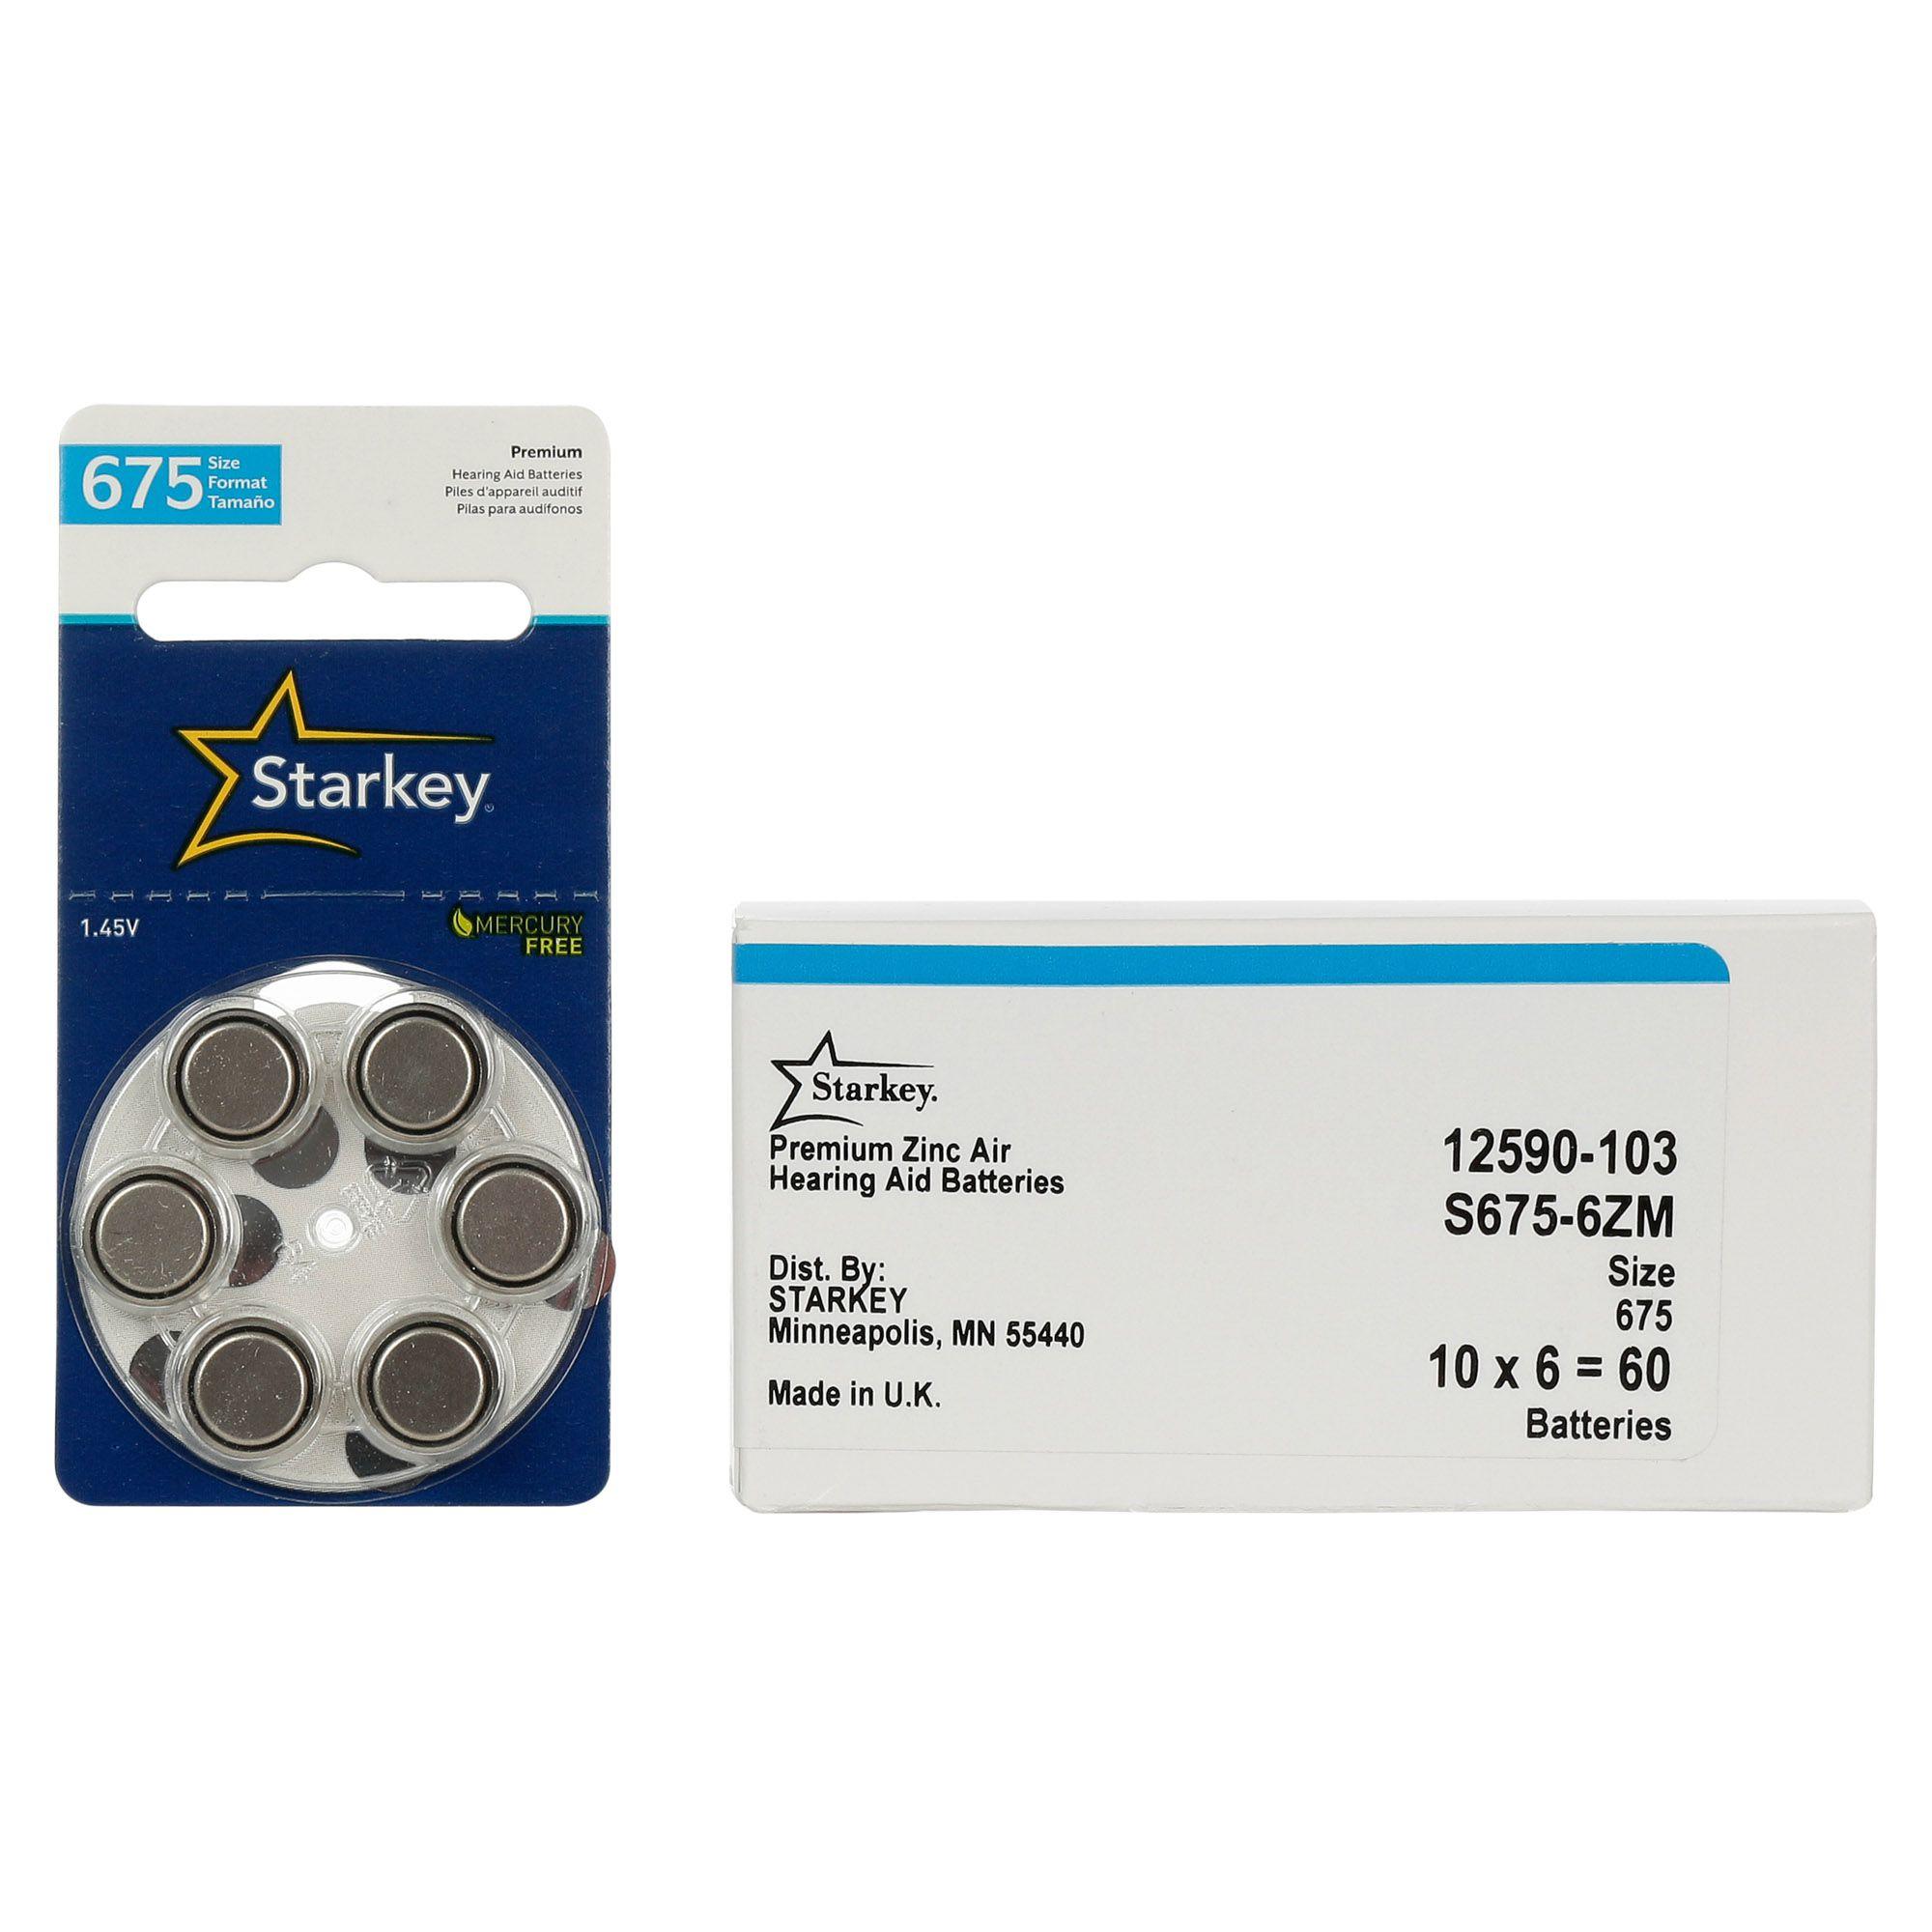 Starkey S675 / PR44 - 10 Cartelas - 60 Baterias para Aparelho Auditivo